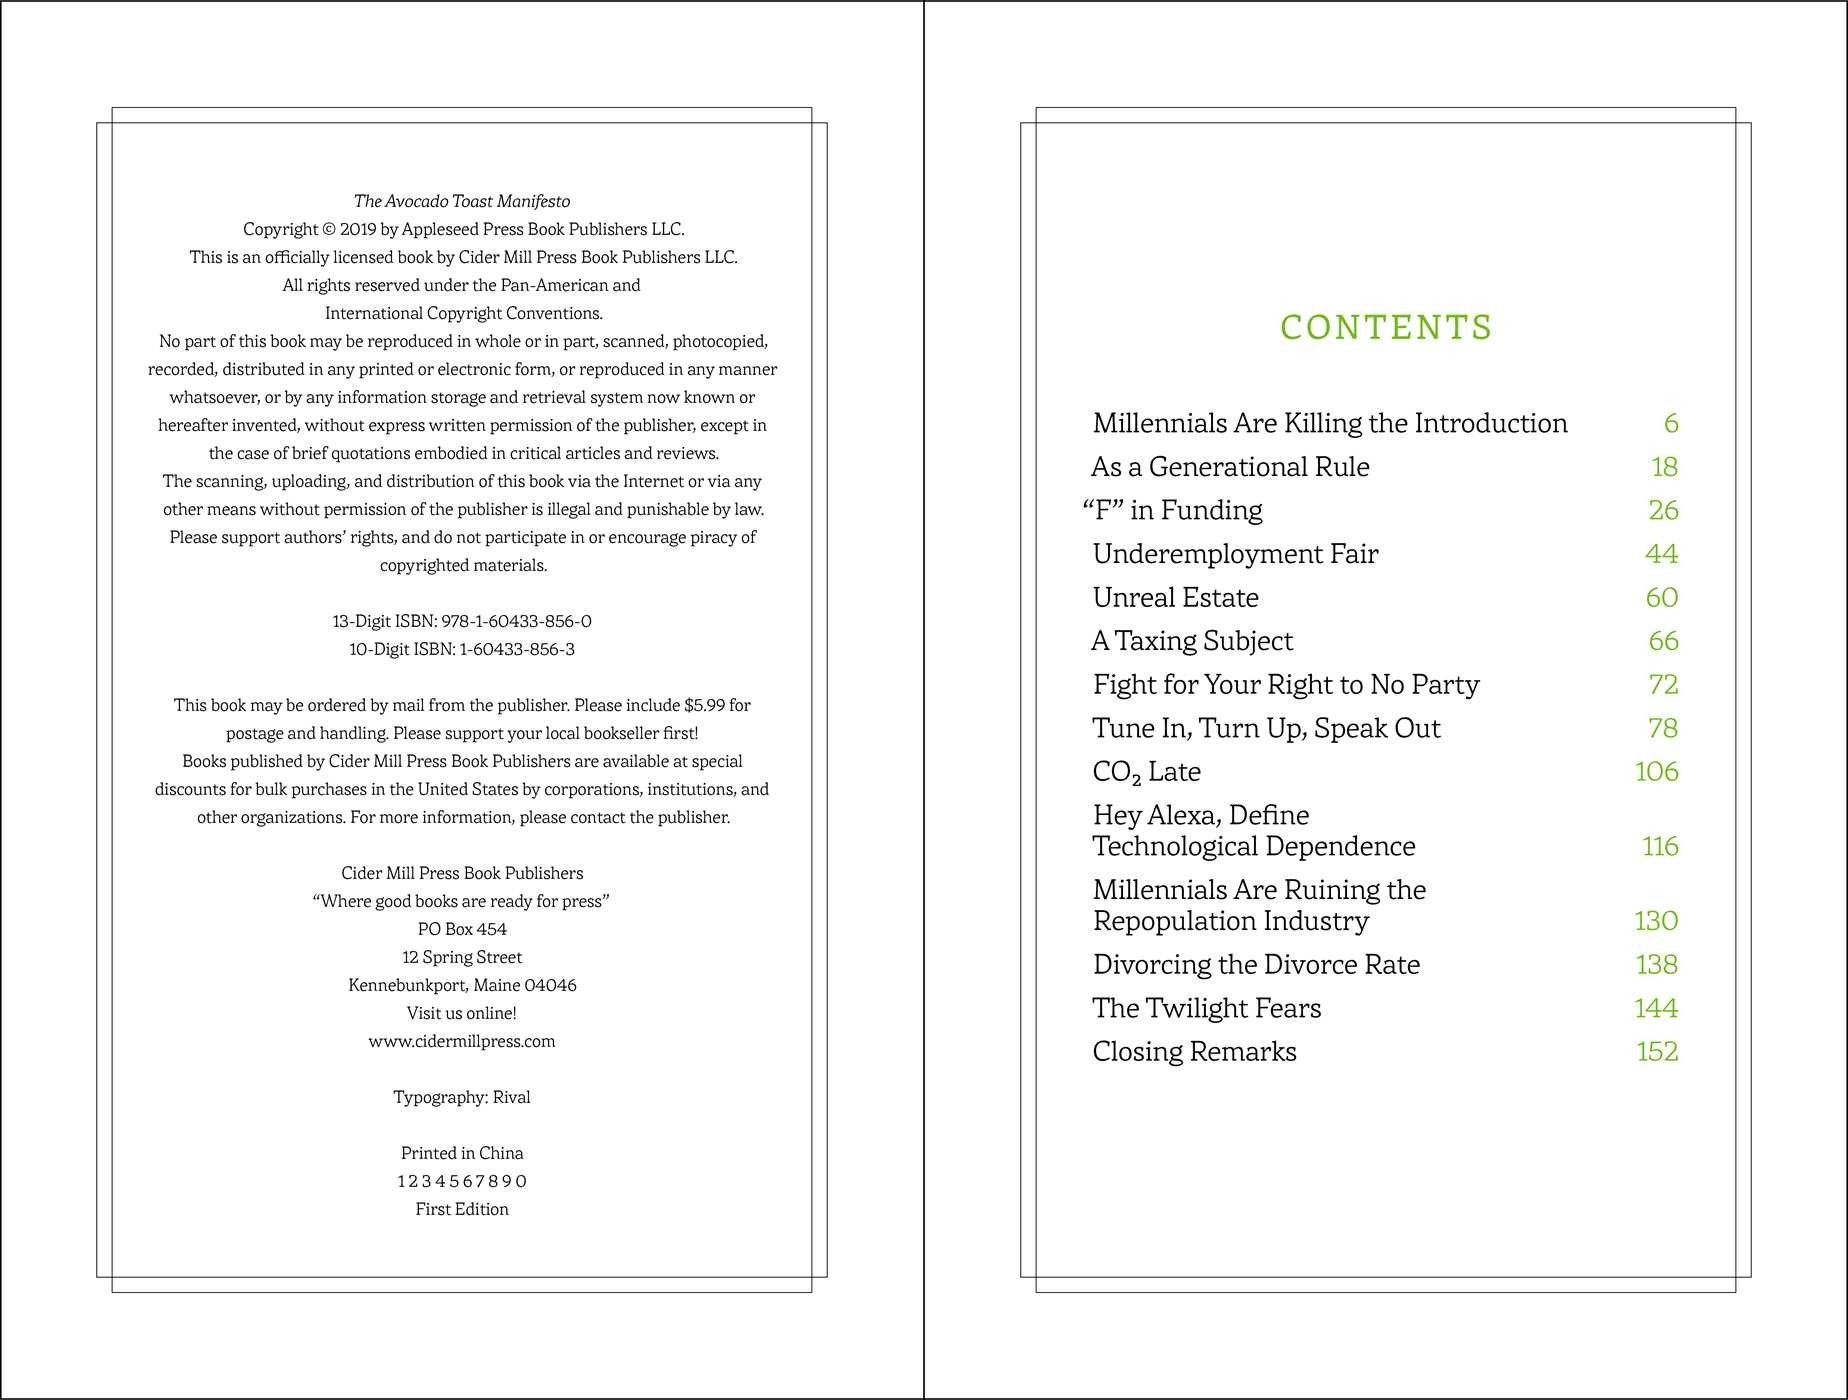 The avocado toast manifesto 9781604338560.in01